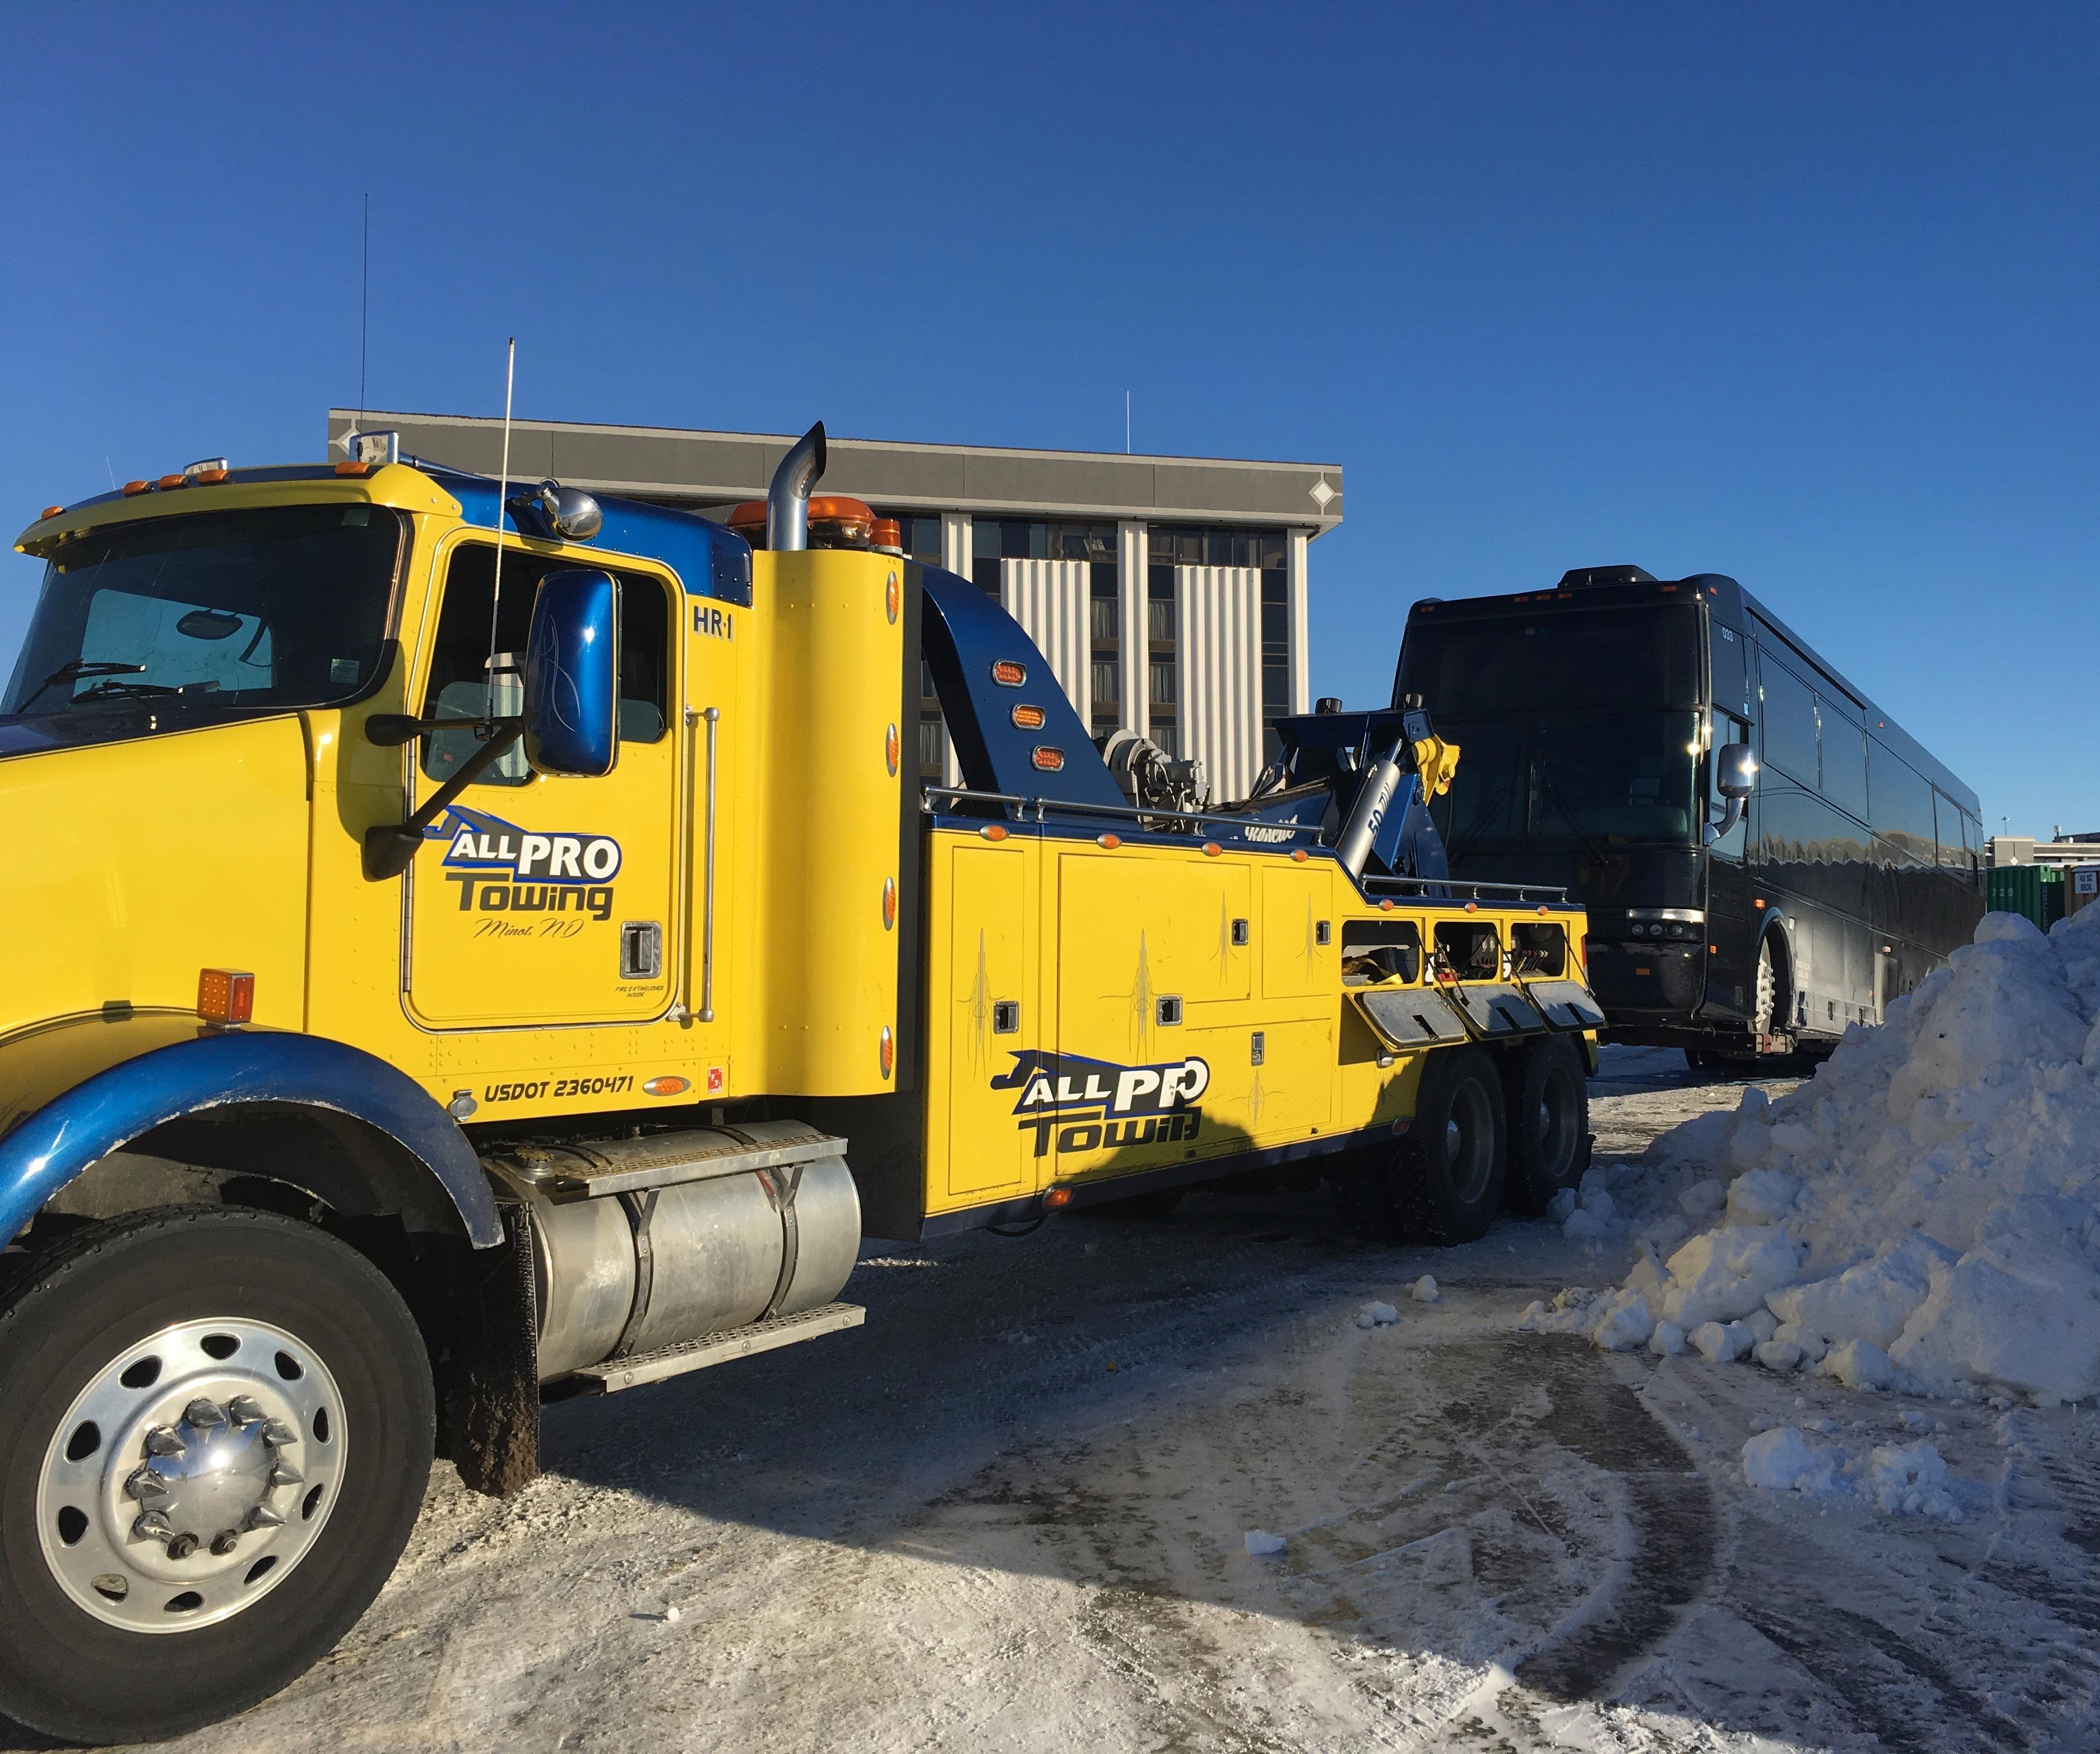 Tire Repair Near Me Open Sunday >> All Pro Towing LLC, Minot North Dakota (ND ...